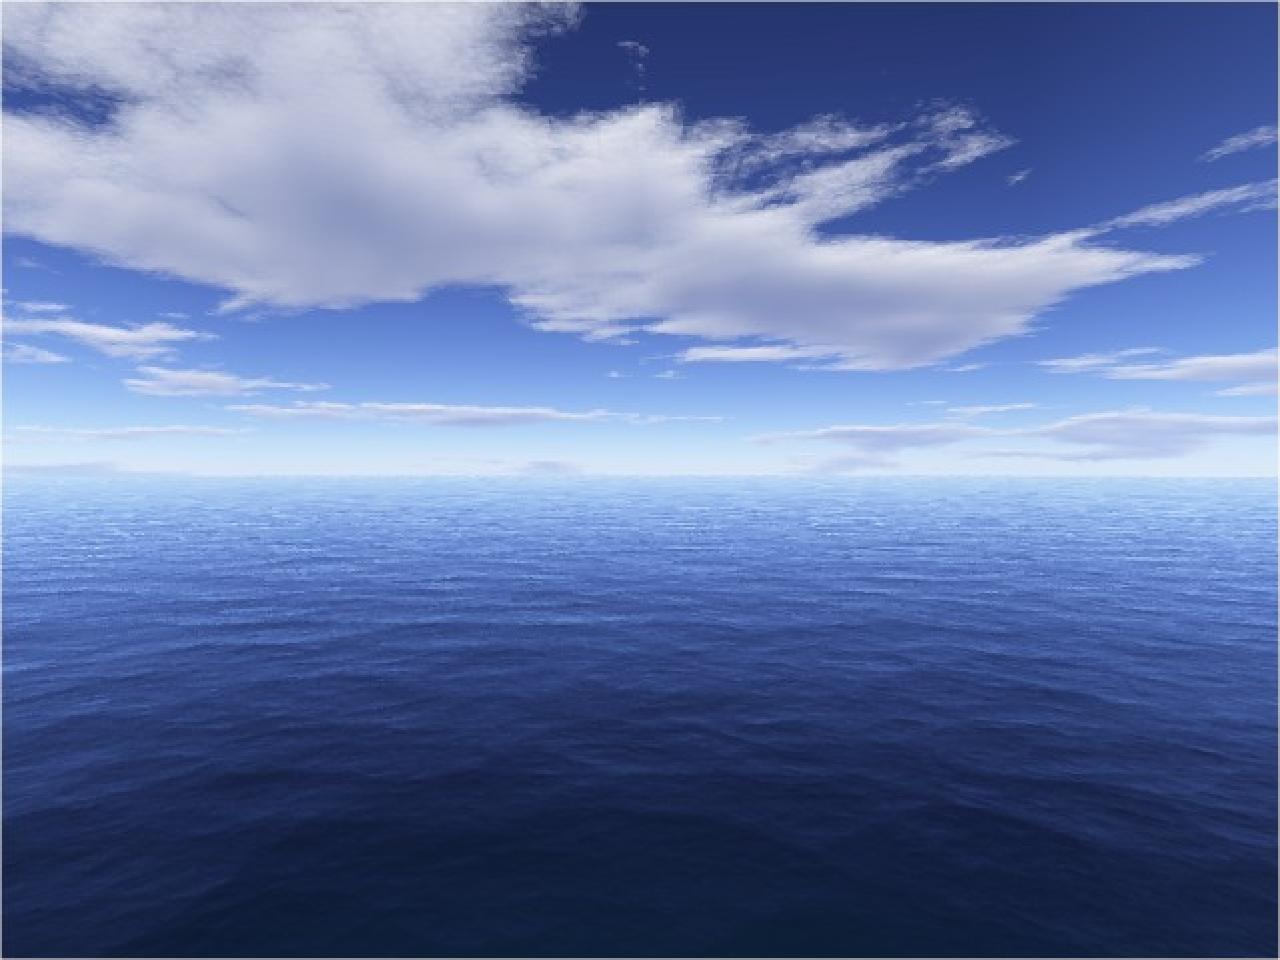 http://1.bp.blogspot.com/-xhrrGDD0_NU/TclPJt2aAKI/AAAAAAAAABE/Icunjh2g3uc/s1600/Ocean%25252B%2525252526%25252BSky%25252B3D%25252B-%25252BBlue%25252BWater.jpg